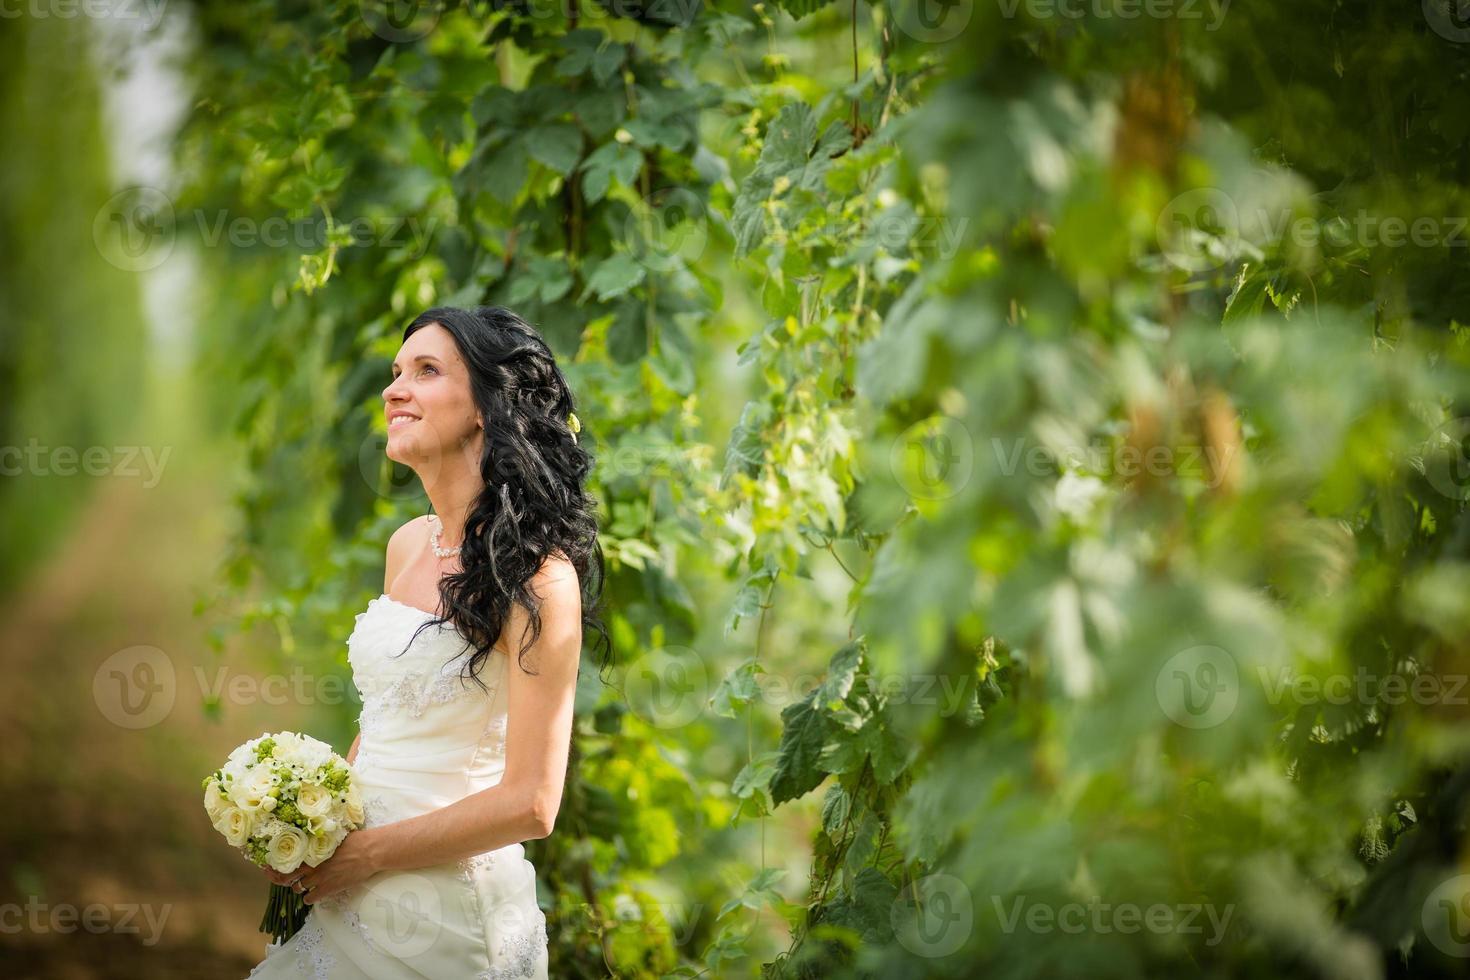 Gorgeous bride on her wedding day photo